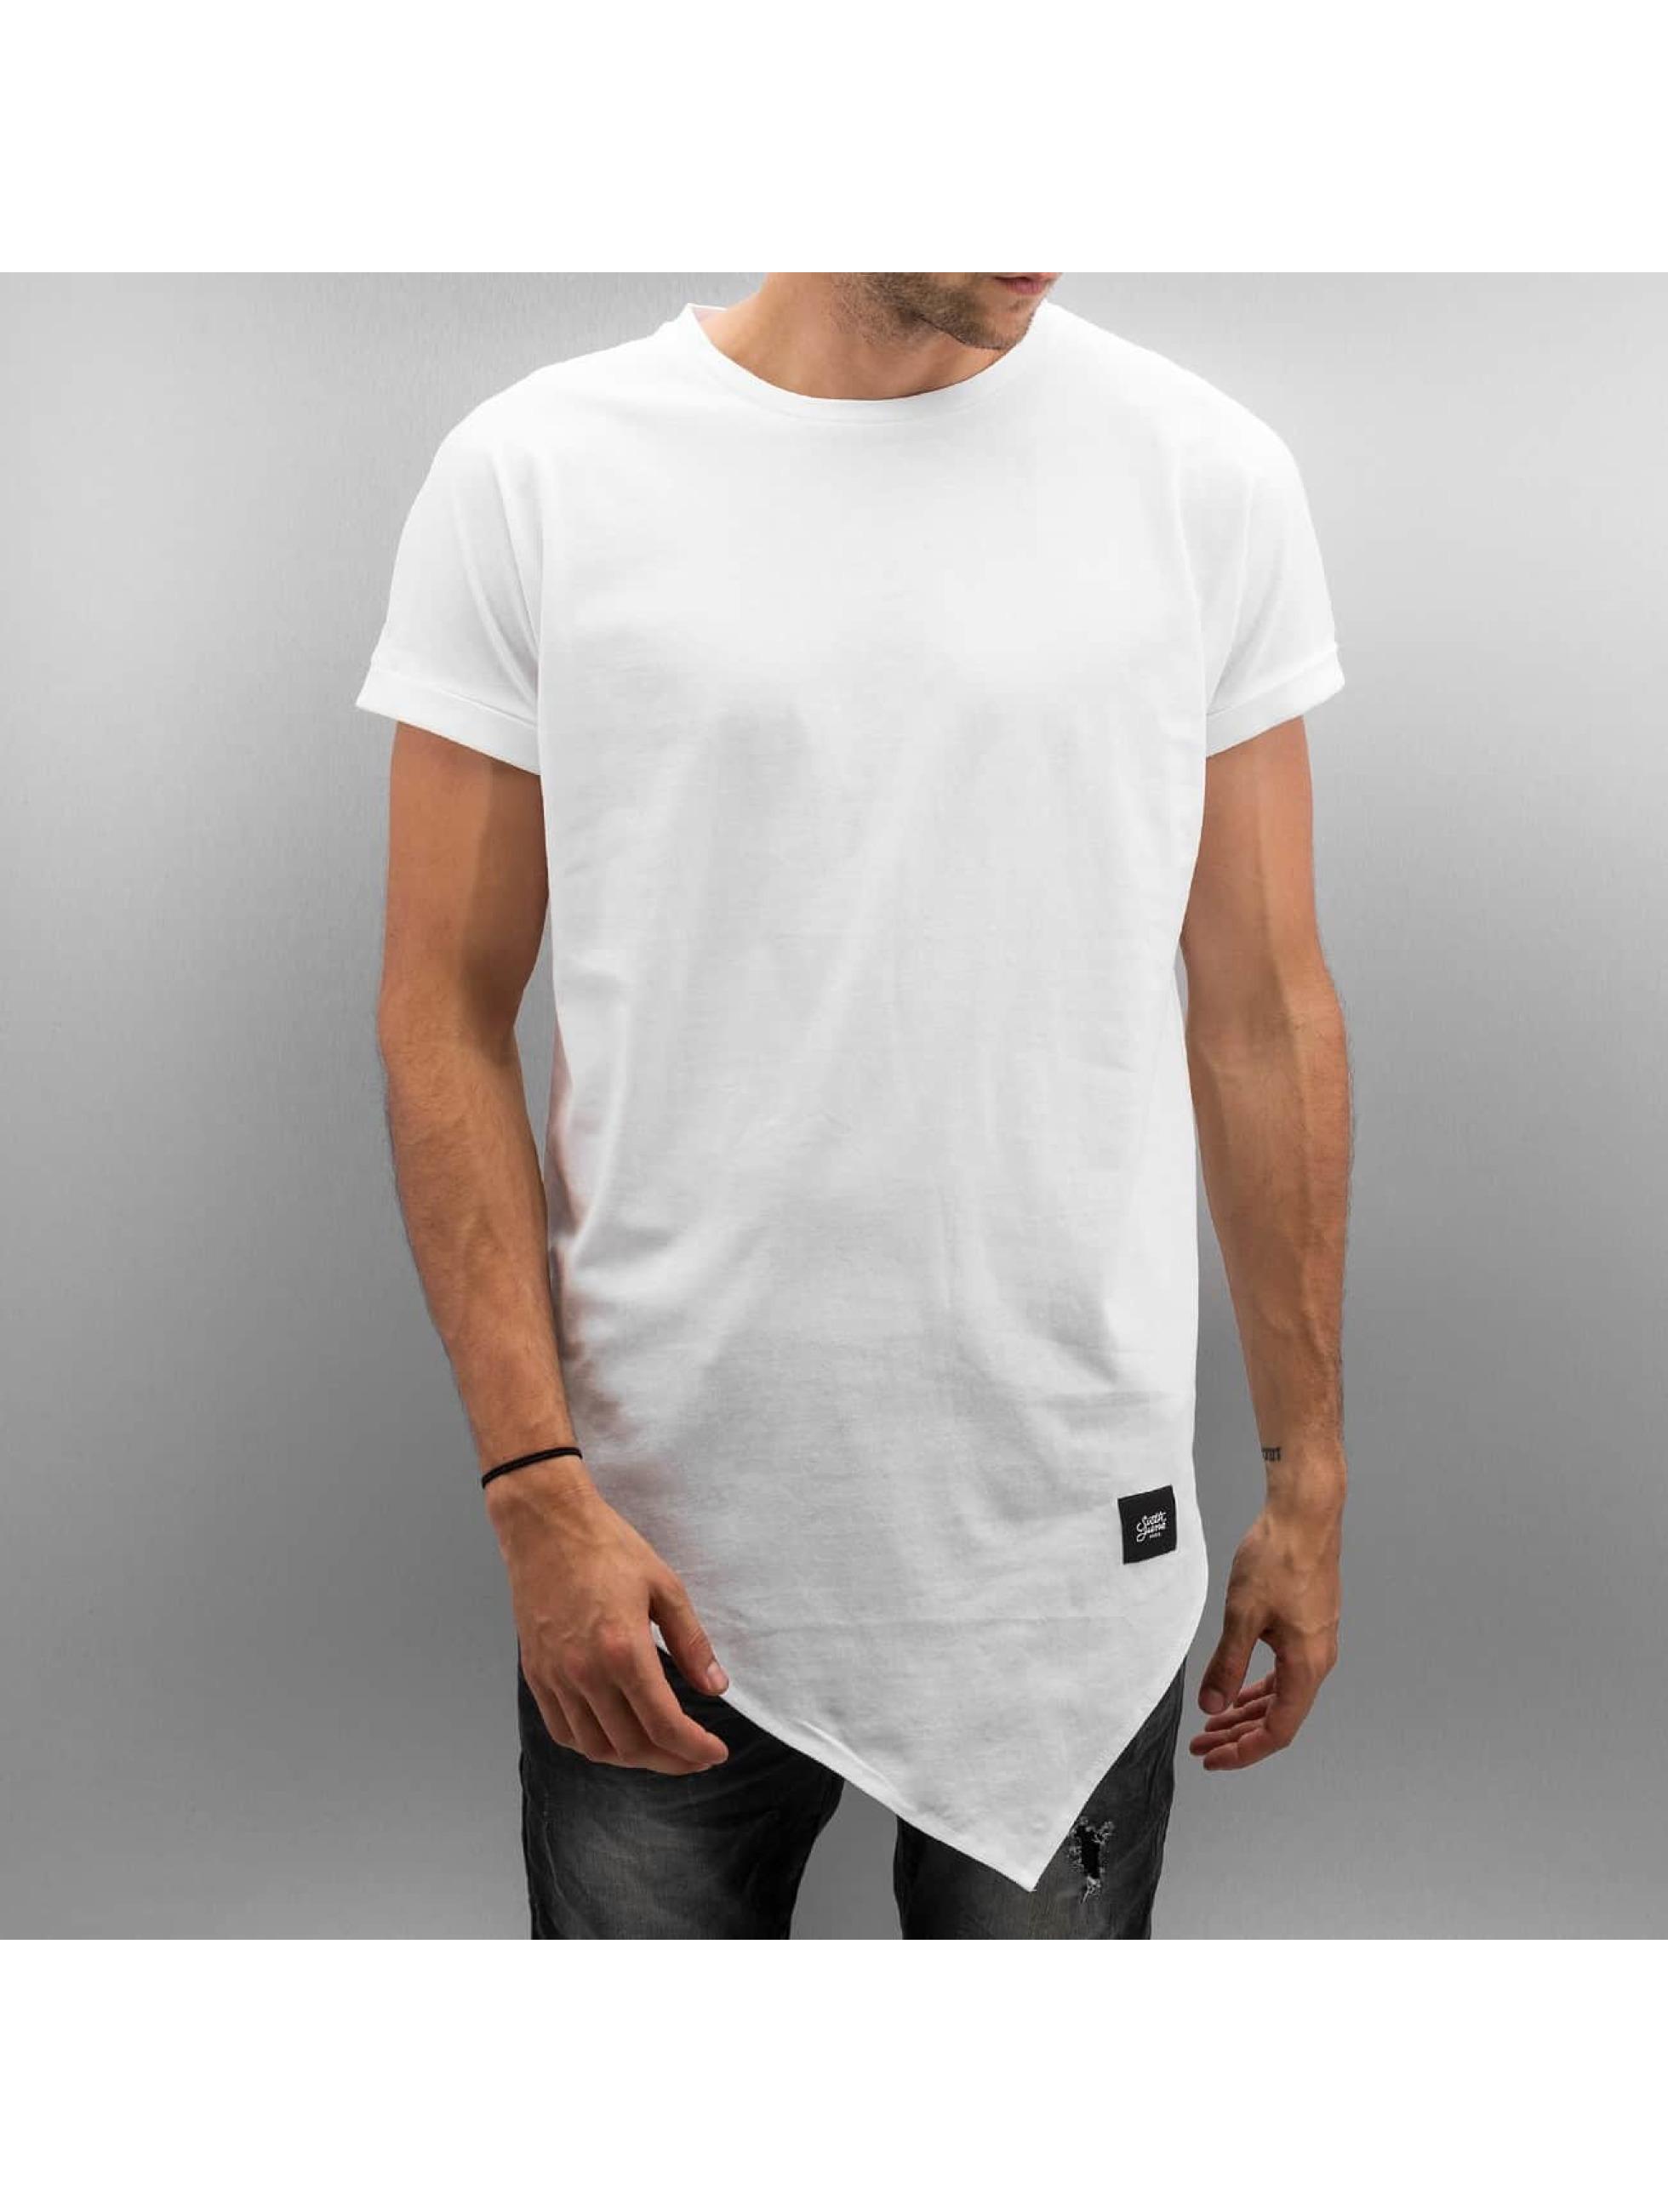 Tall Tees Asymetrical in weiß